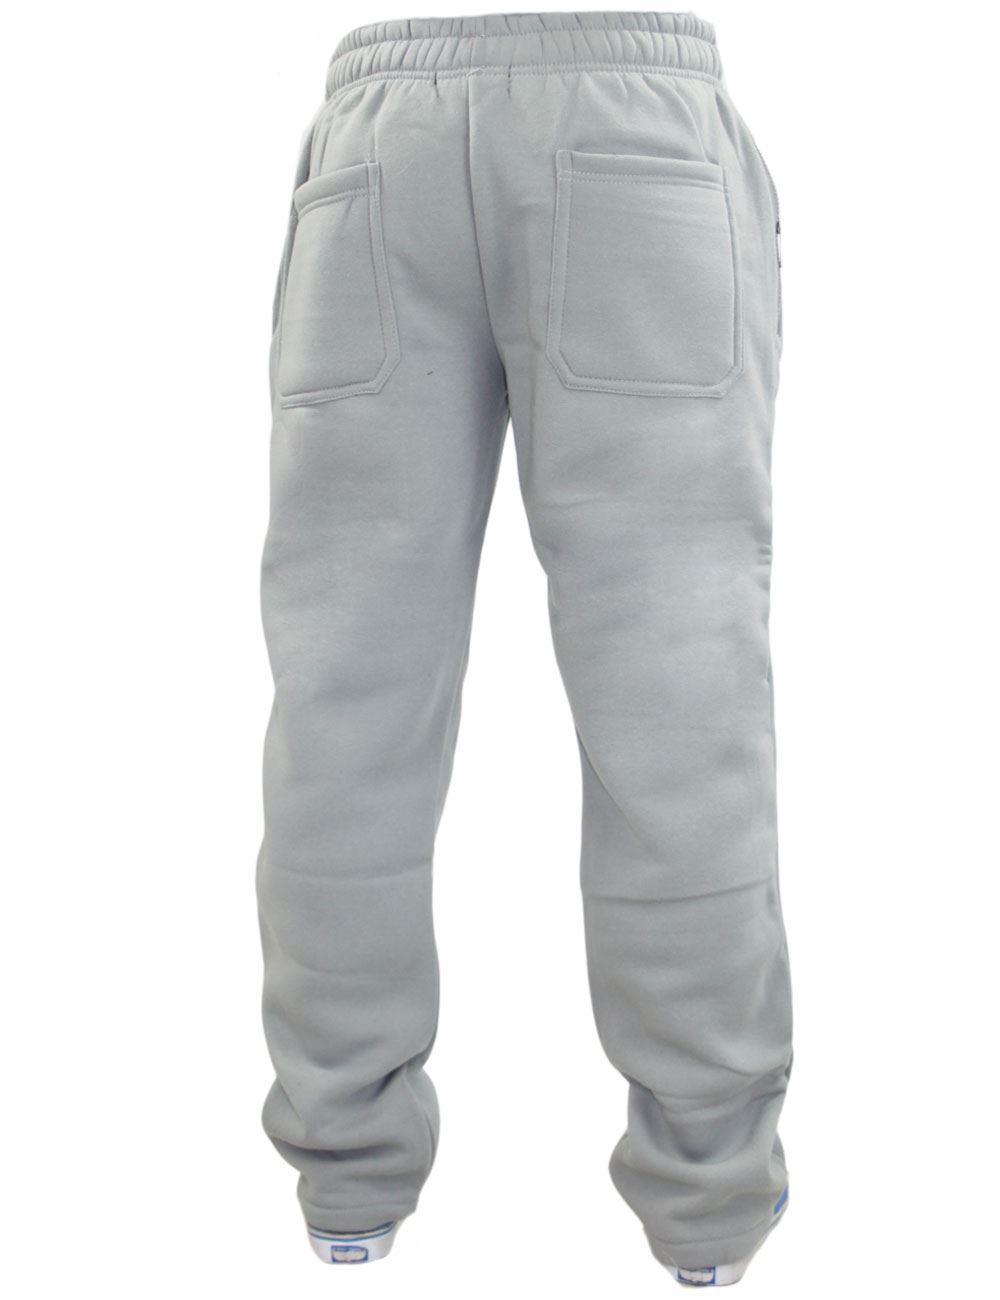 Mens-Women-Plain-Fleece-Joggers-Bottoms-Jogging-Pant-Gym-Fitness-Sports-Trousers thumbnail 34